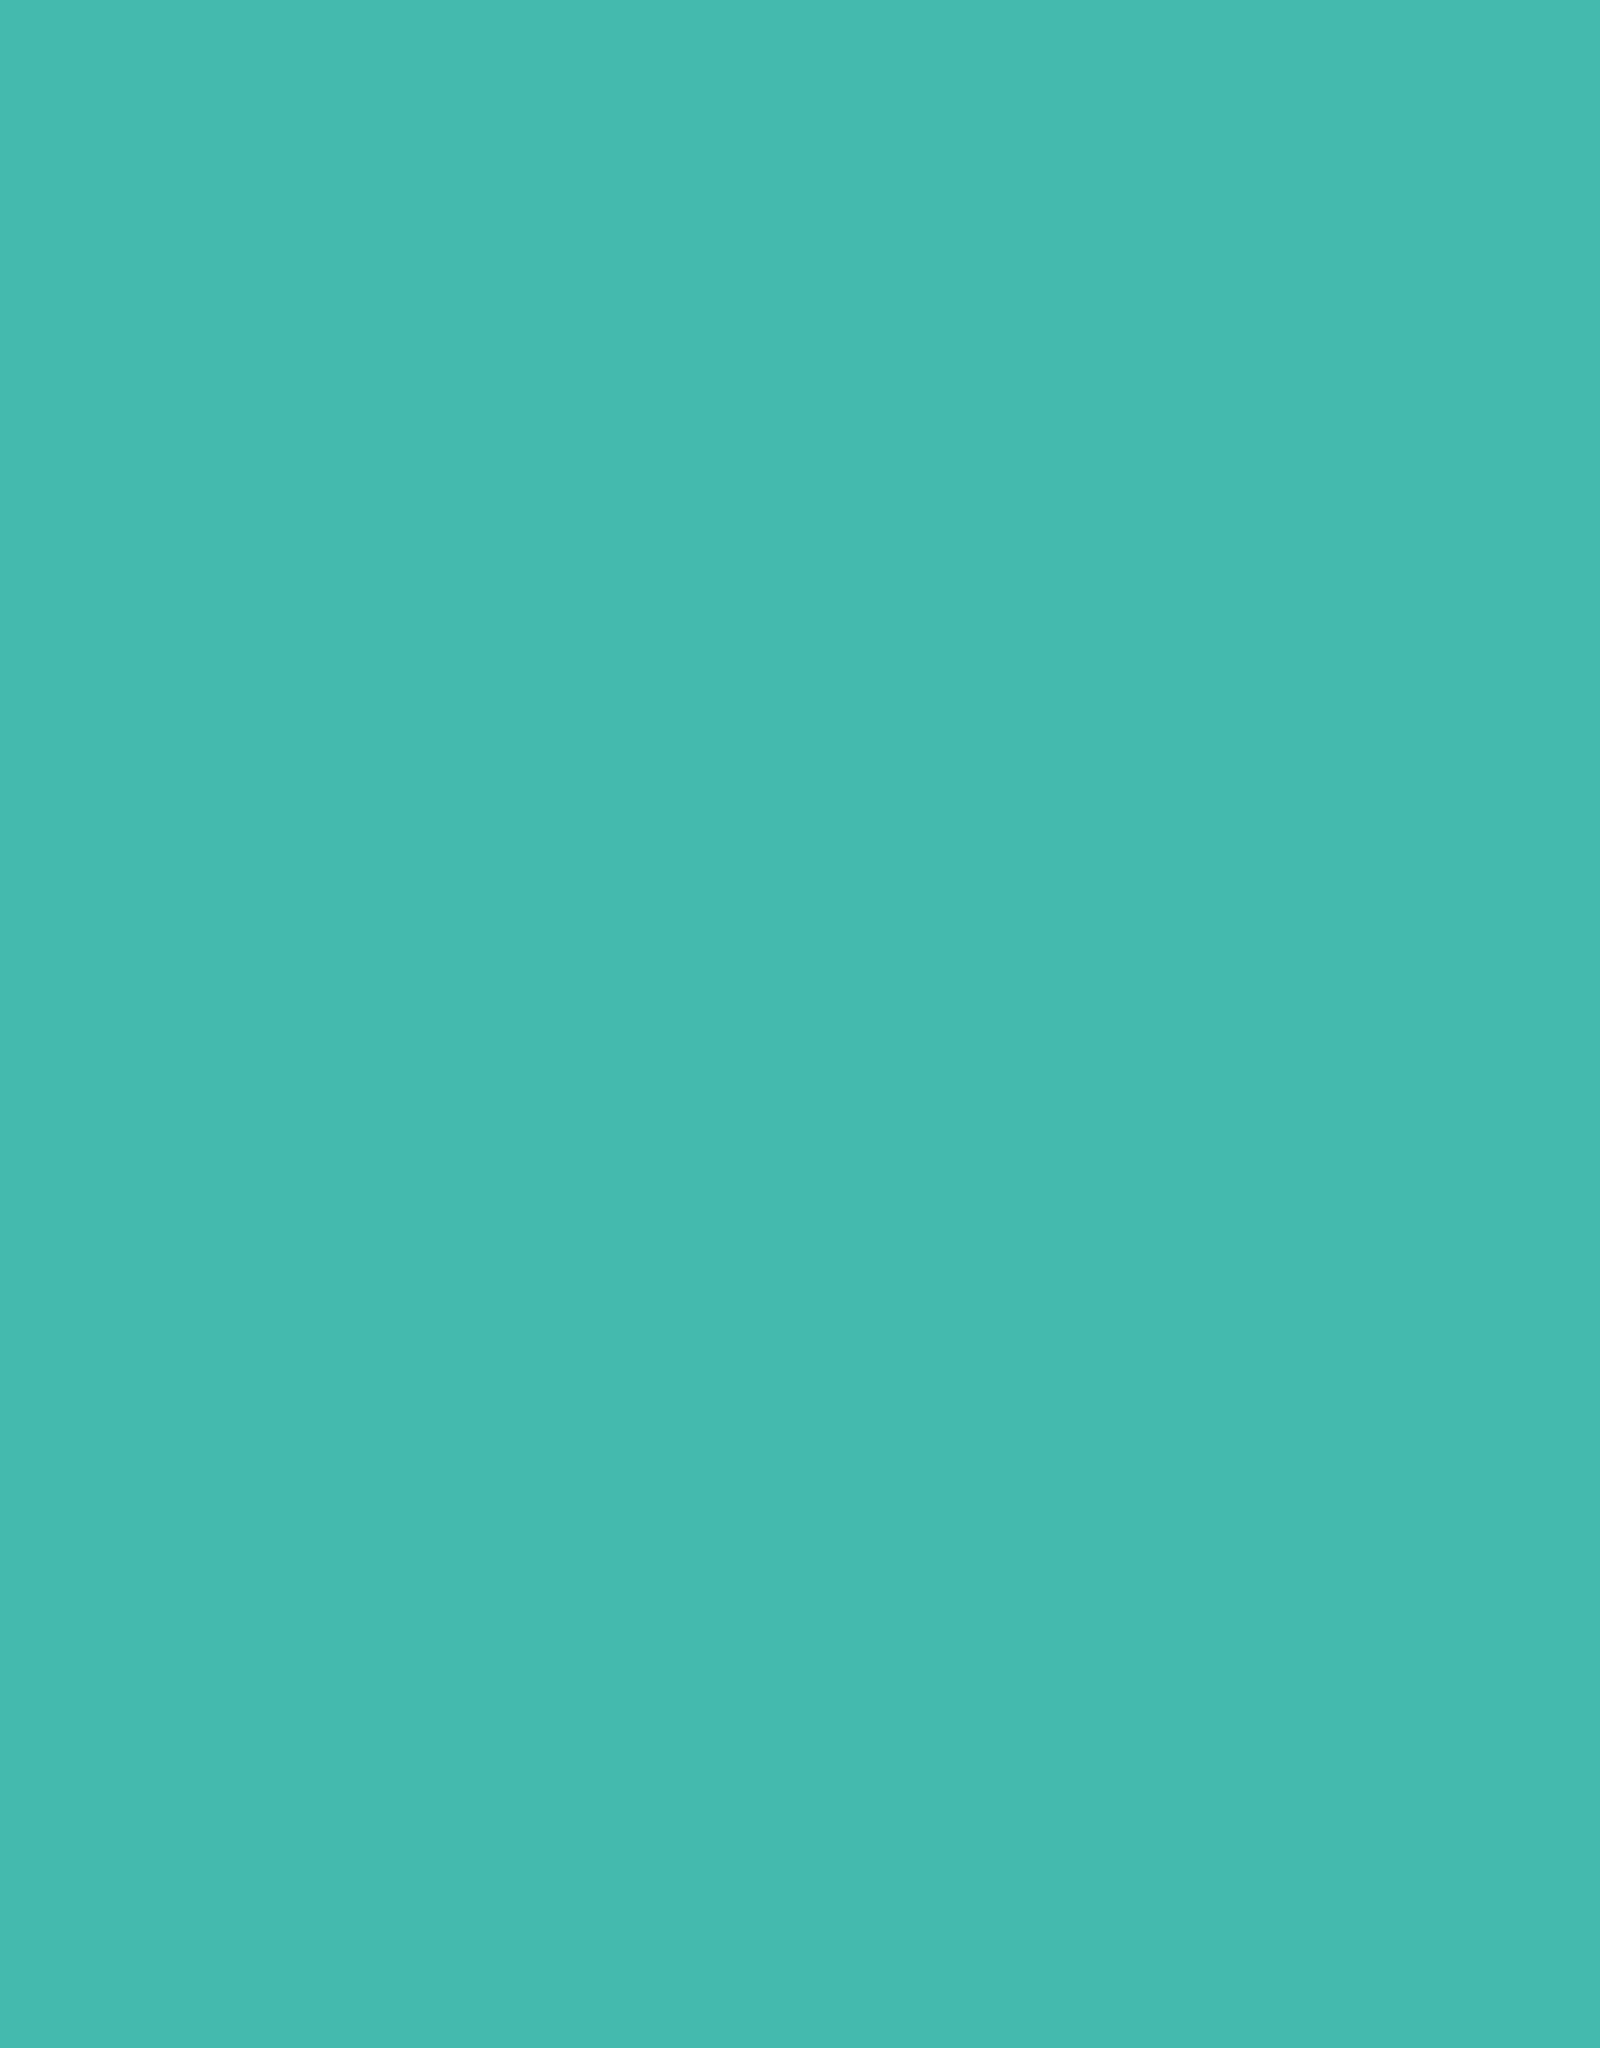 Trapsuutjies Textile Paint Aqua L